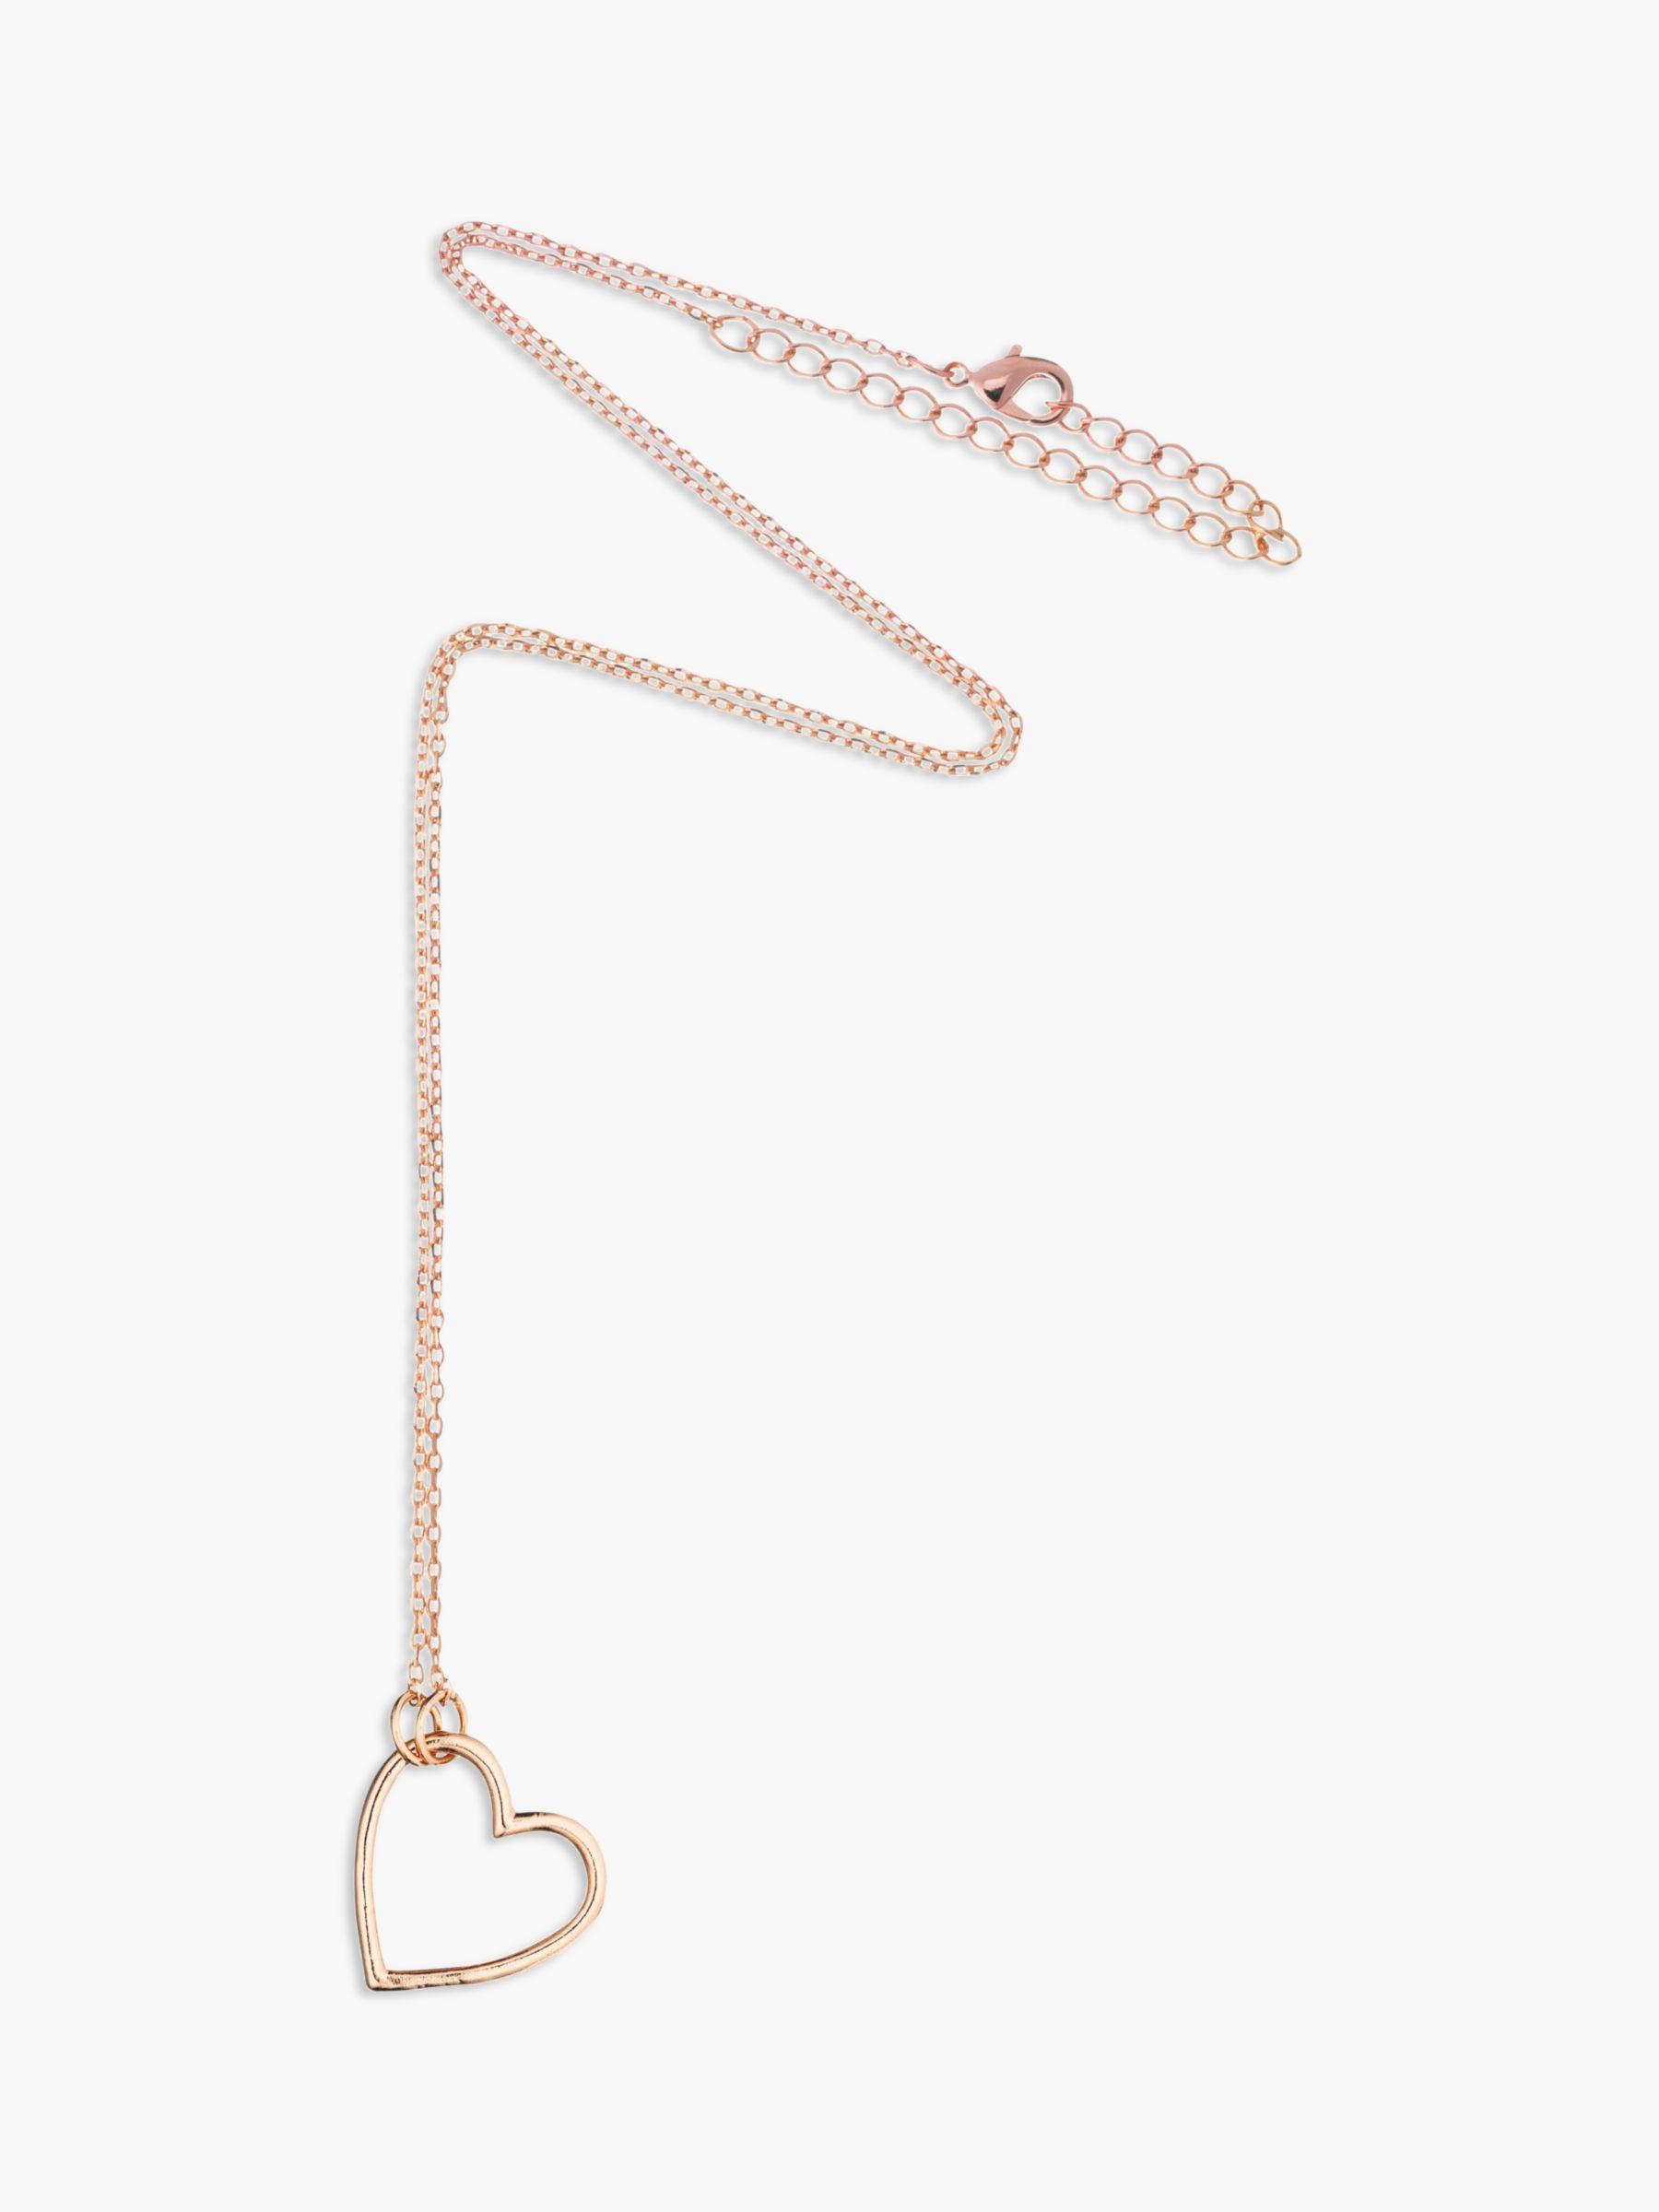 Estella Bartlett Estella Bartlett Open Heart Pendant Necklace, Gold